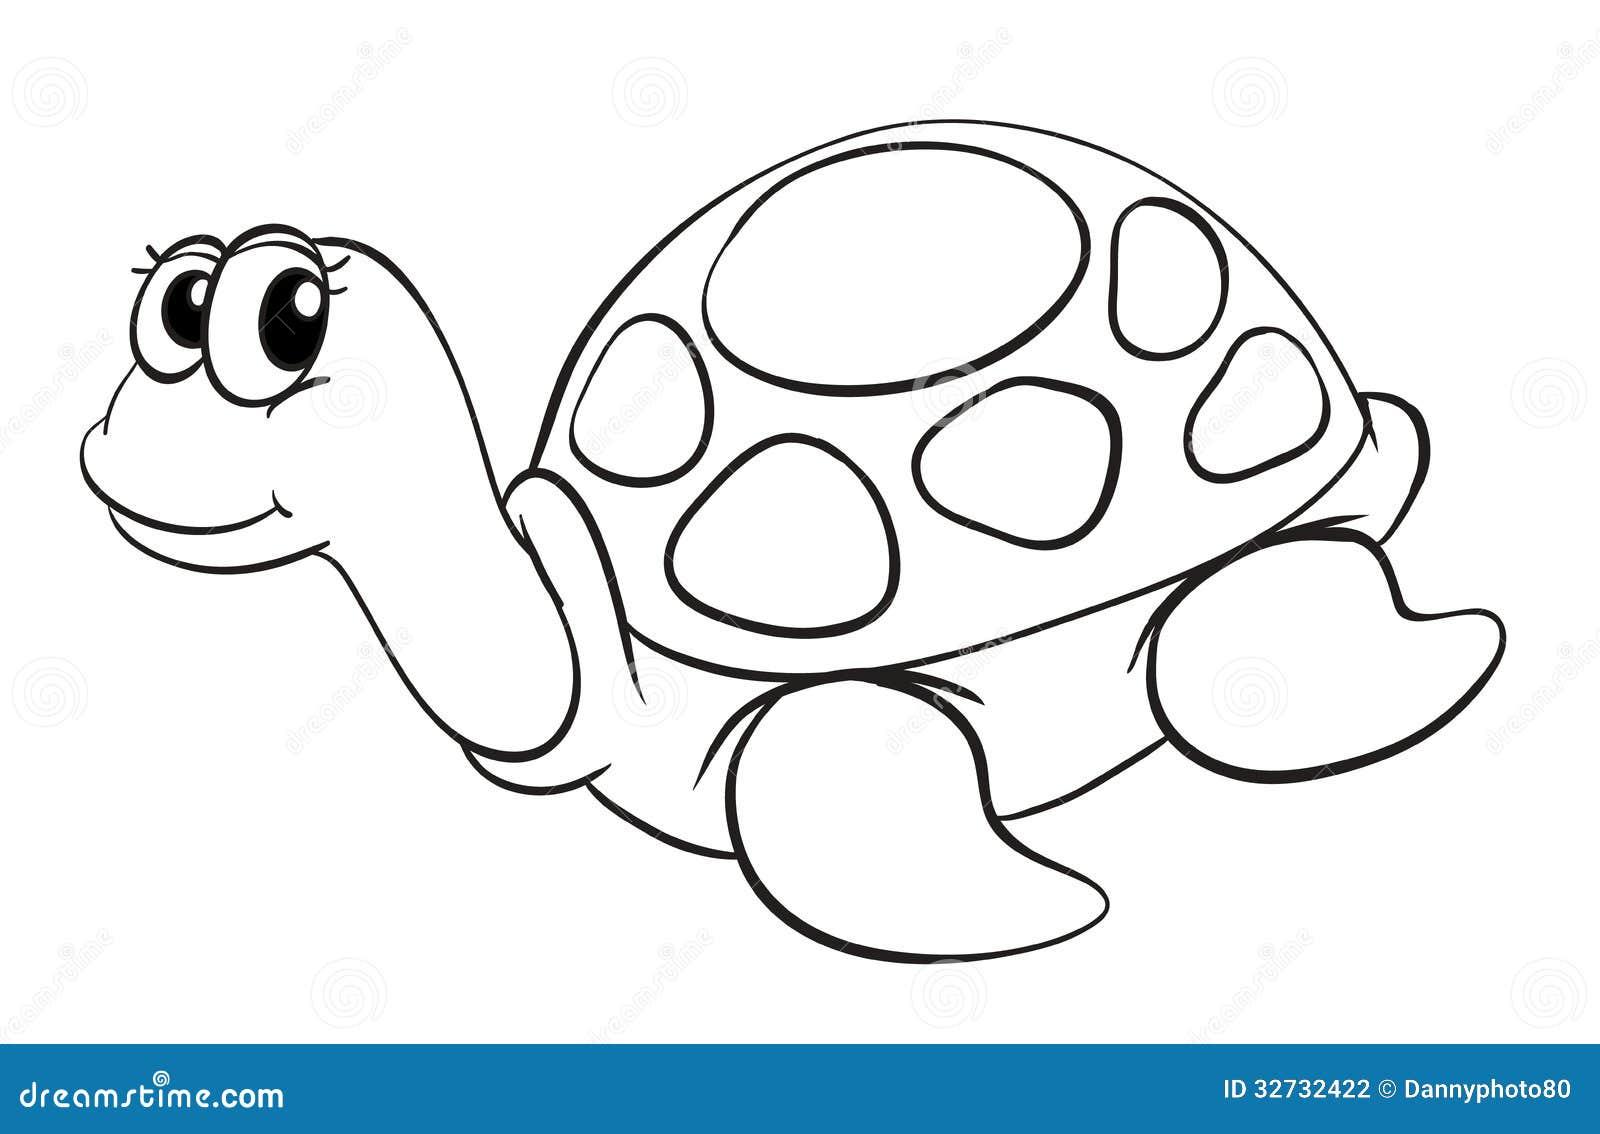 Illustration Of A Tortoise Sketch On White Background